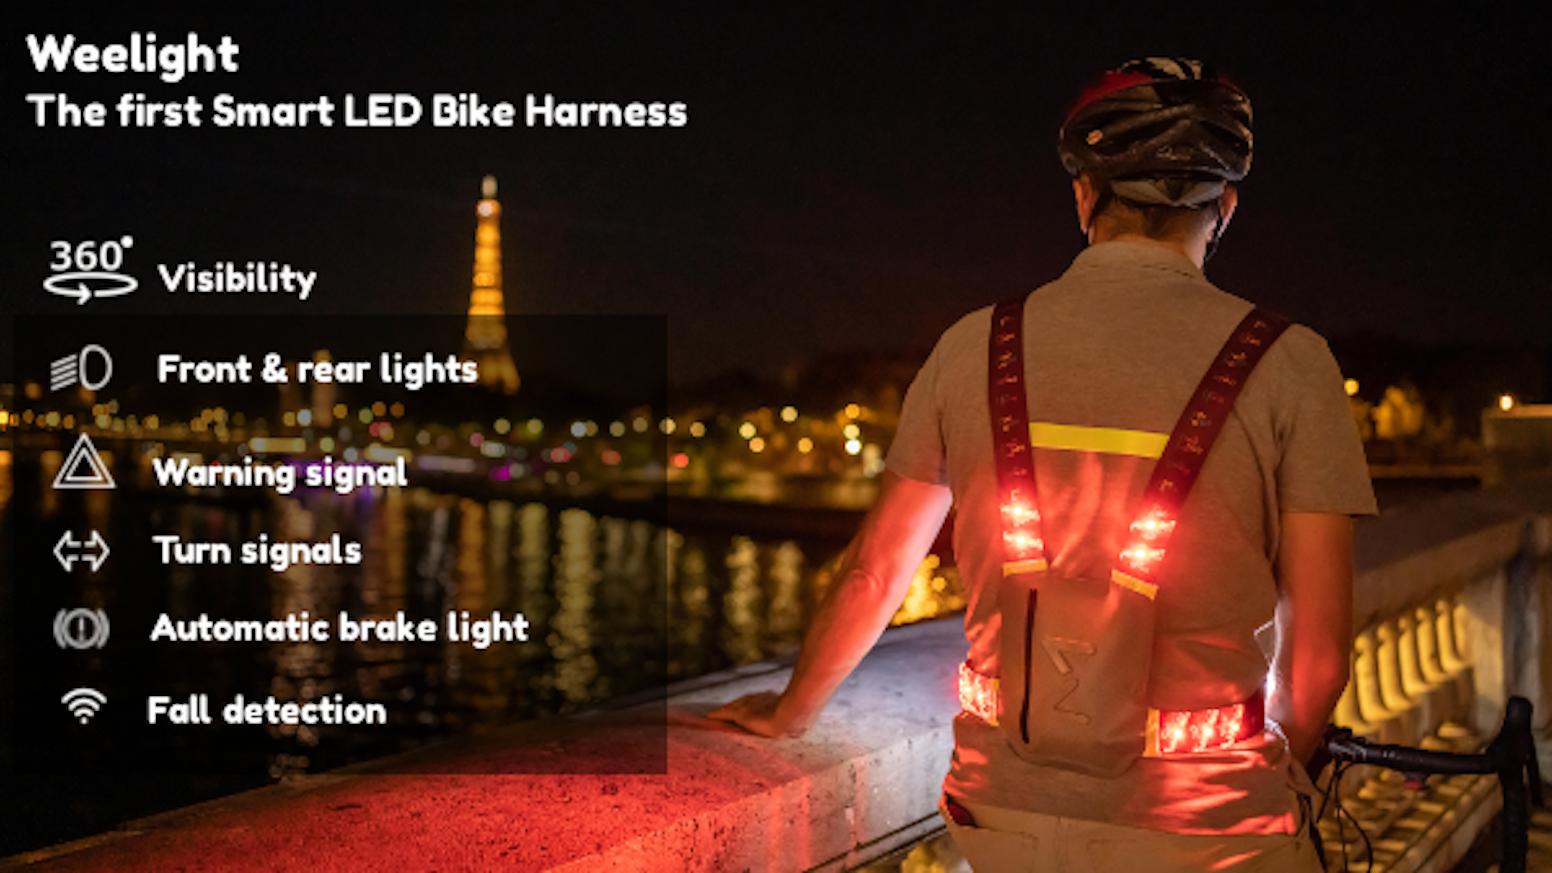 Weelight – The first Smart LED Bike Harness by Weelight — Kickstarter